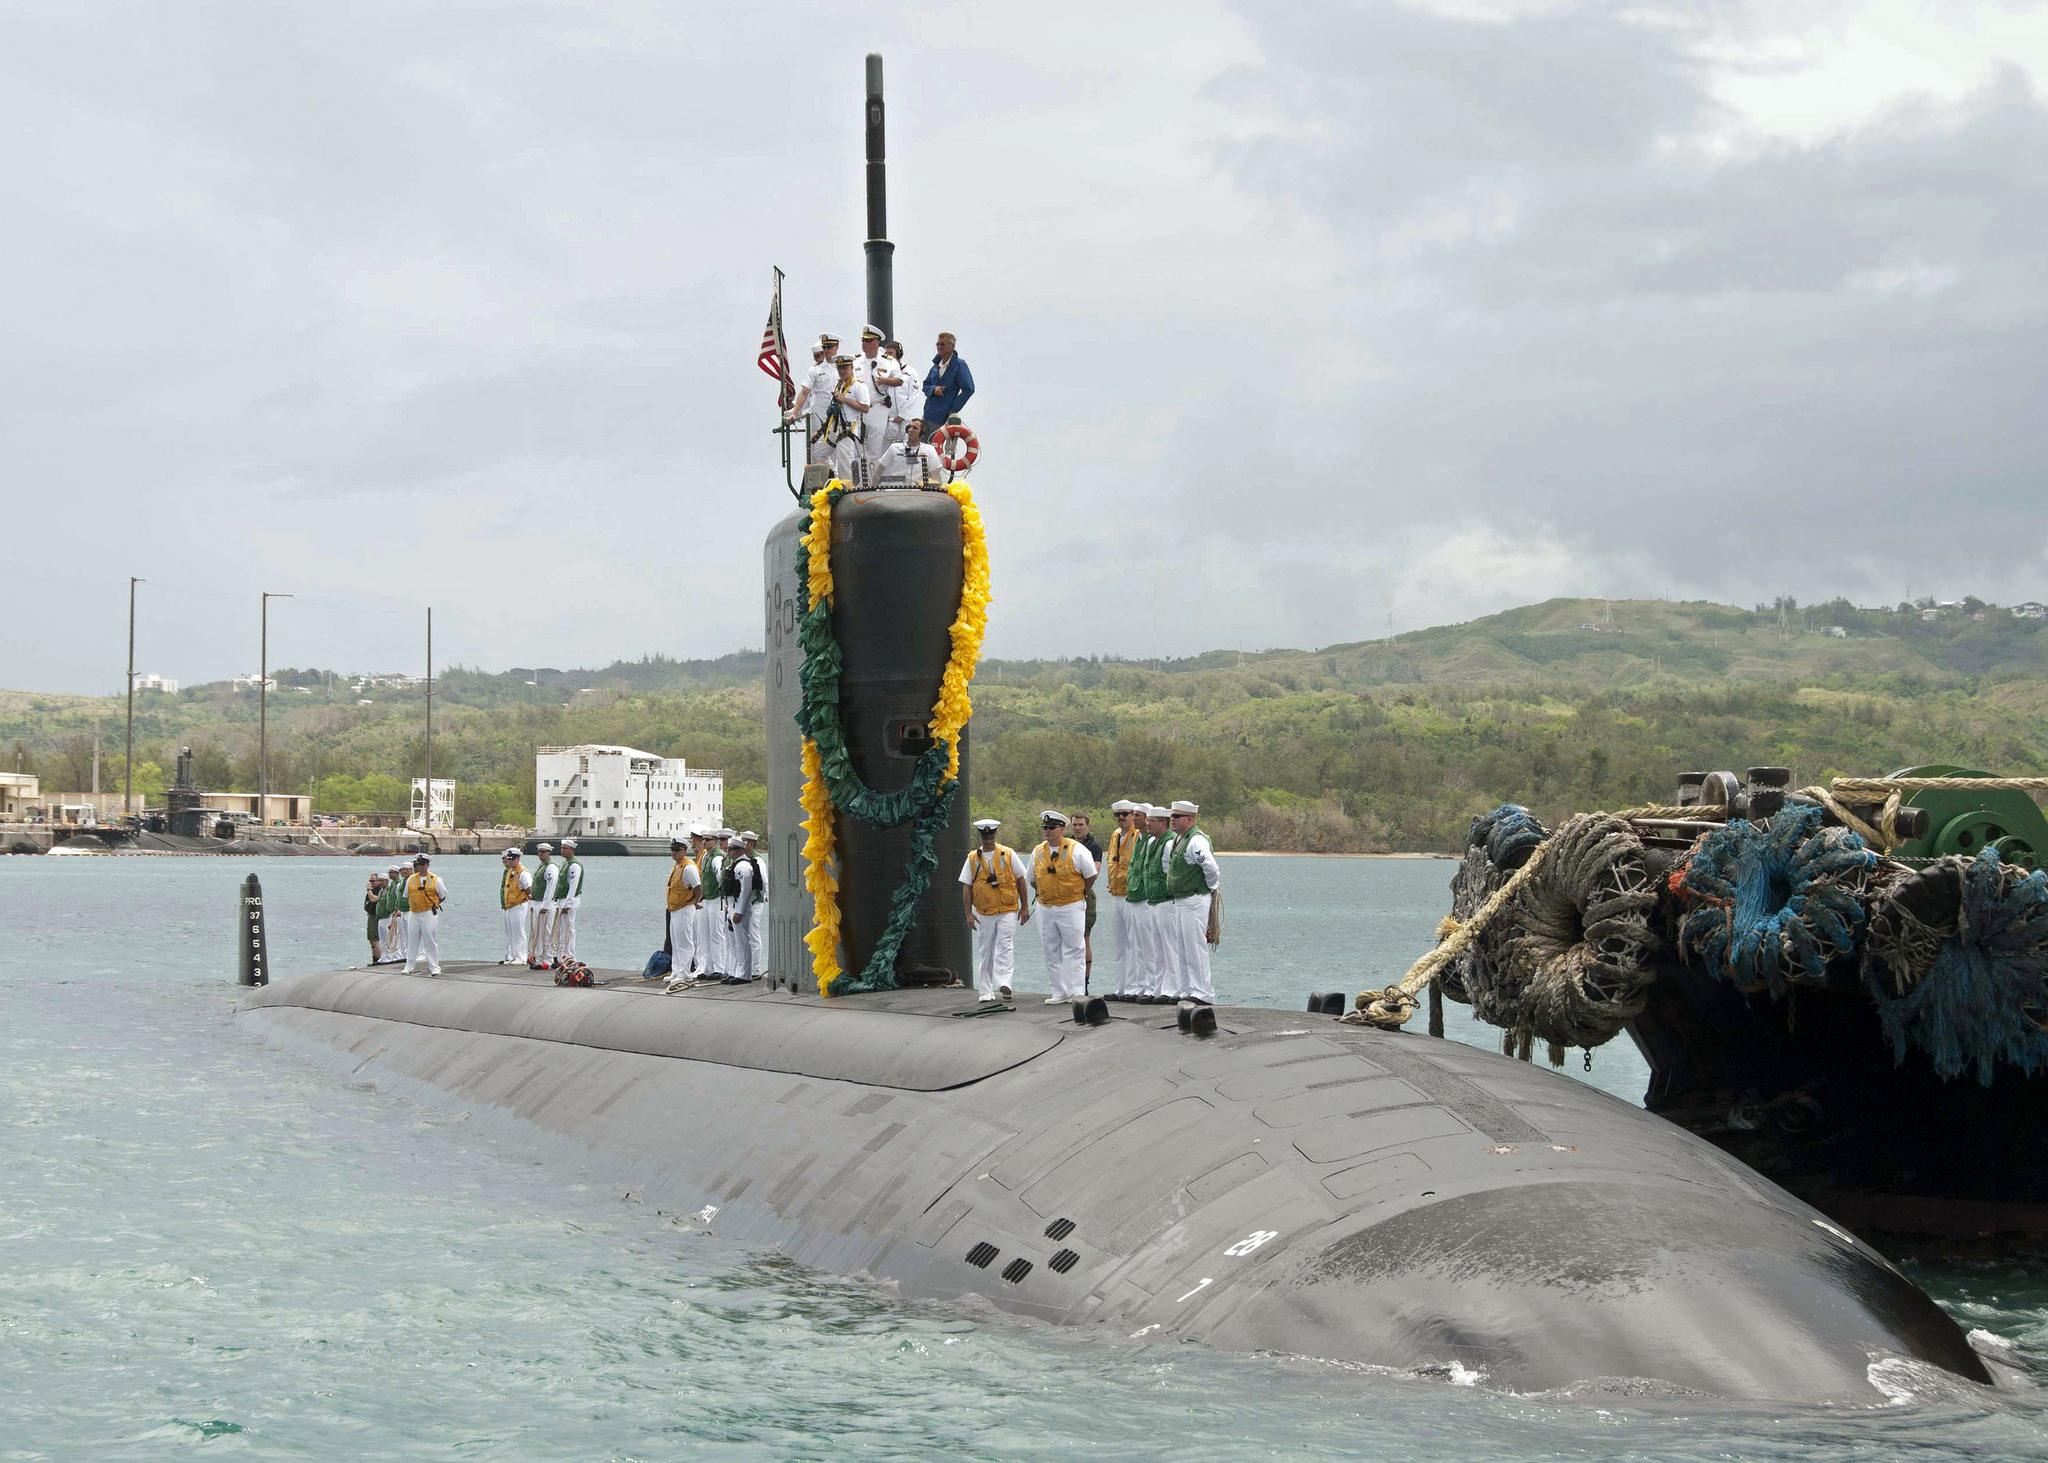 USS TOPEKA SSN-764 Einlaufen Apra Harbor, Guam am 29.05.2015 Bild: U.S. Navy